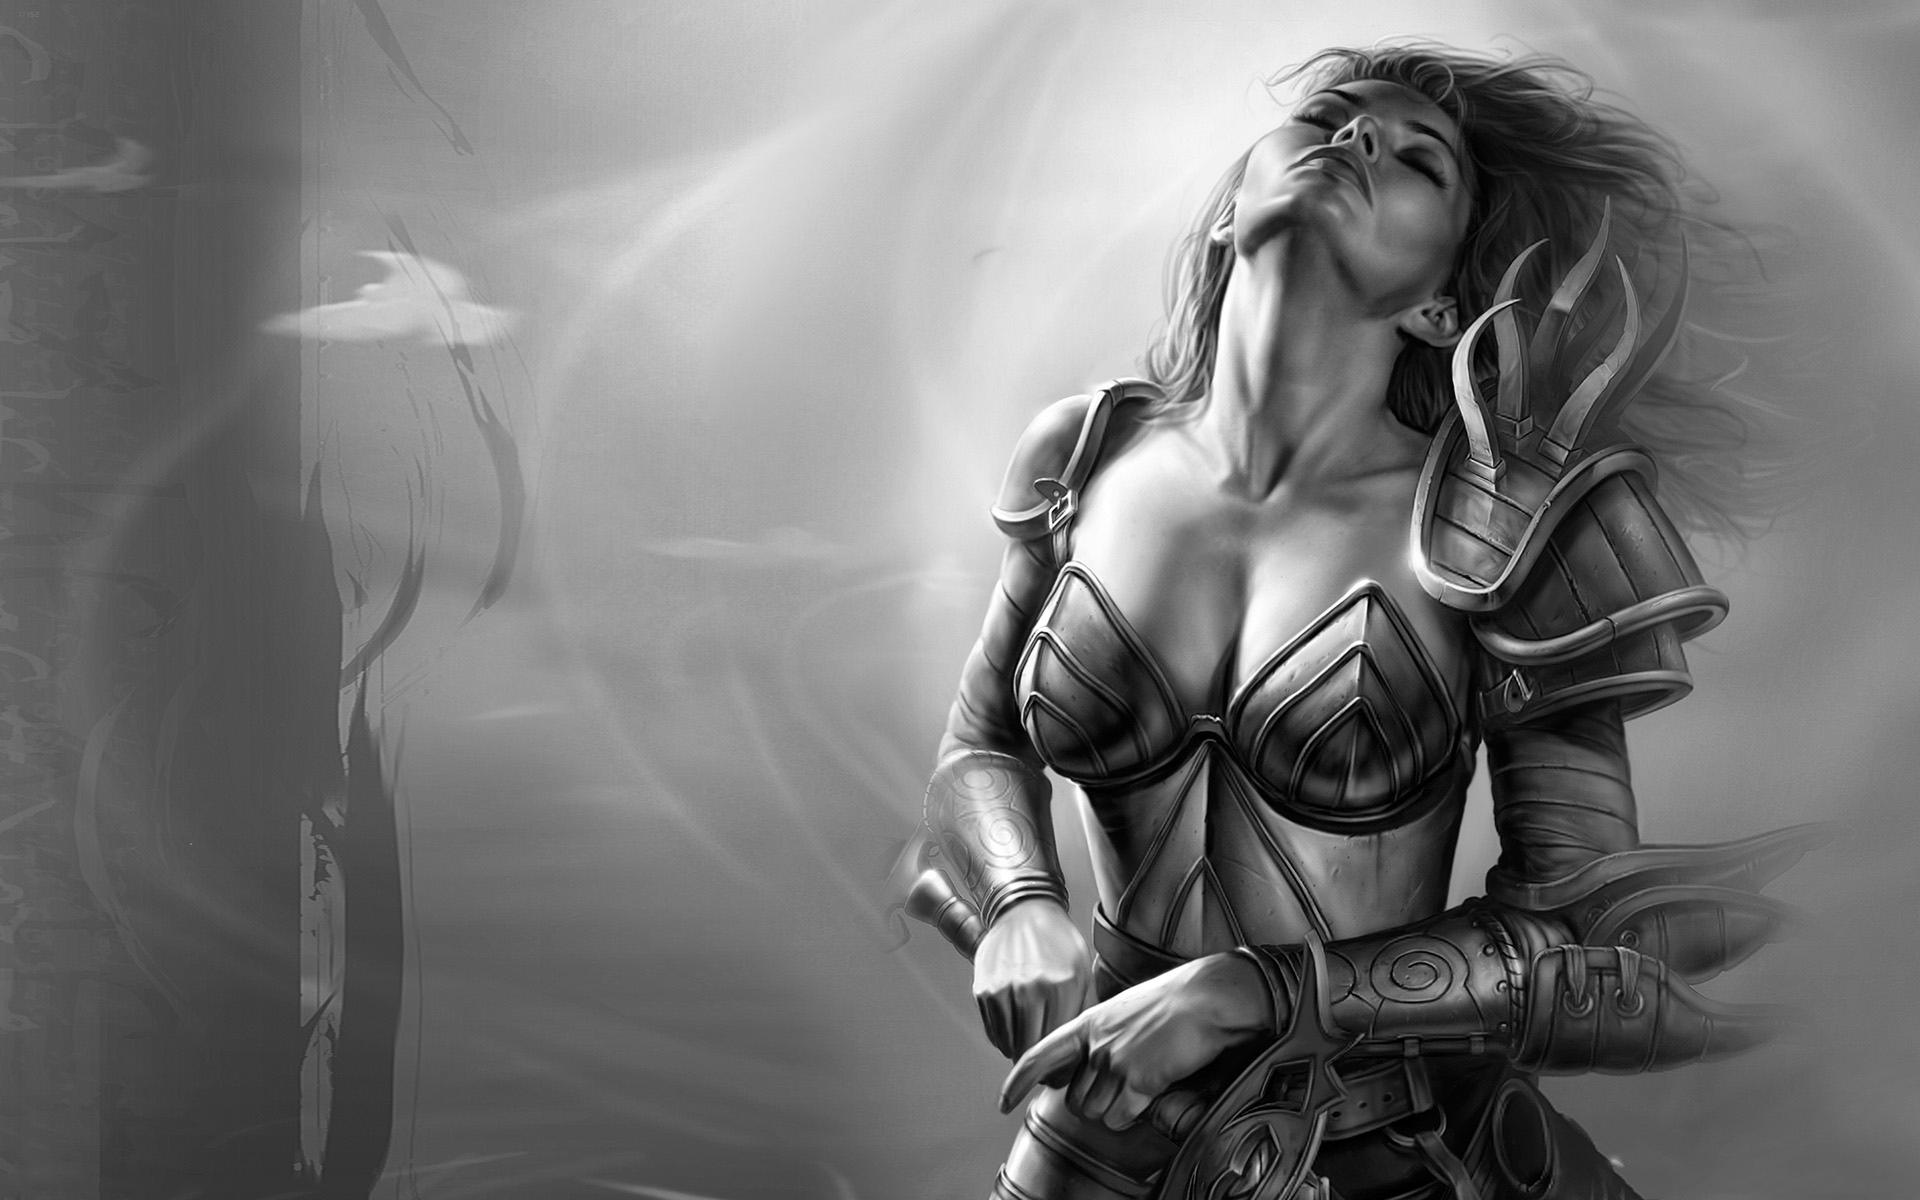 Woman armor monochrome